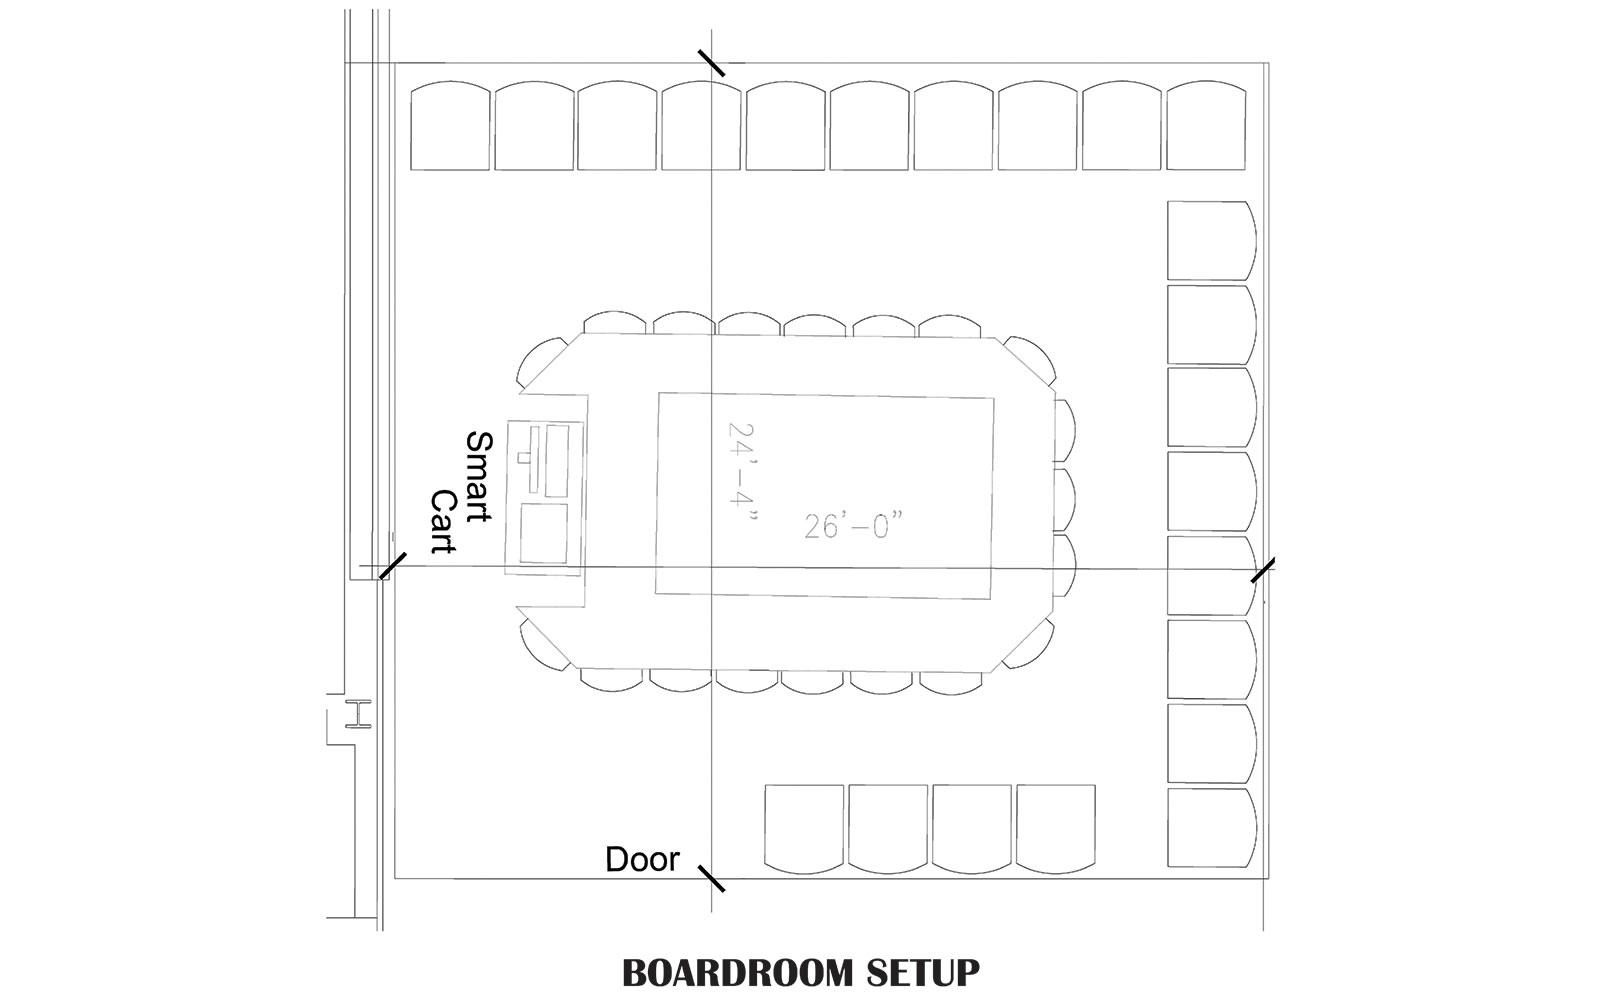 hight resolution of room diagrams boardroom setup boardroom setup boardroom setup boardroom setup boardroom setup